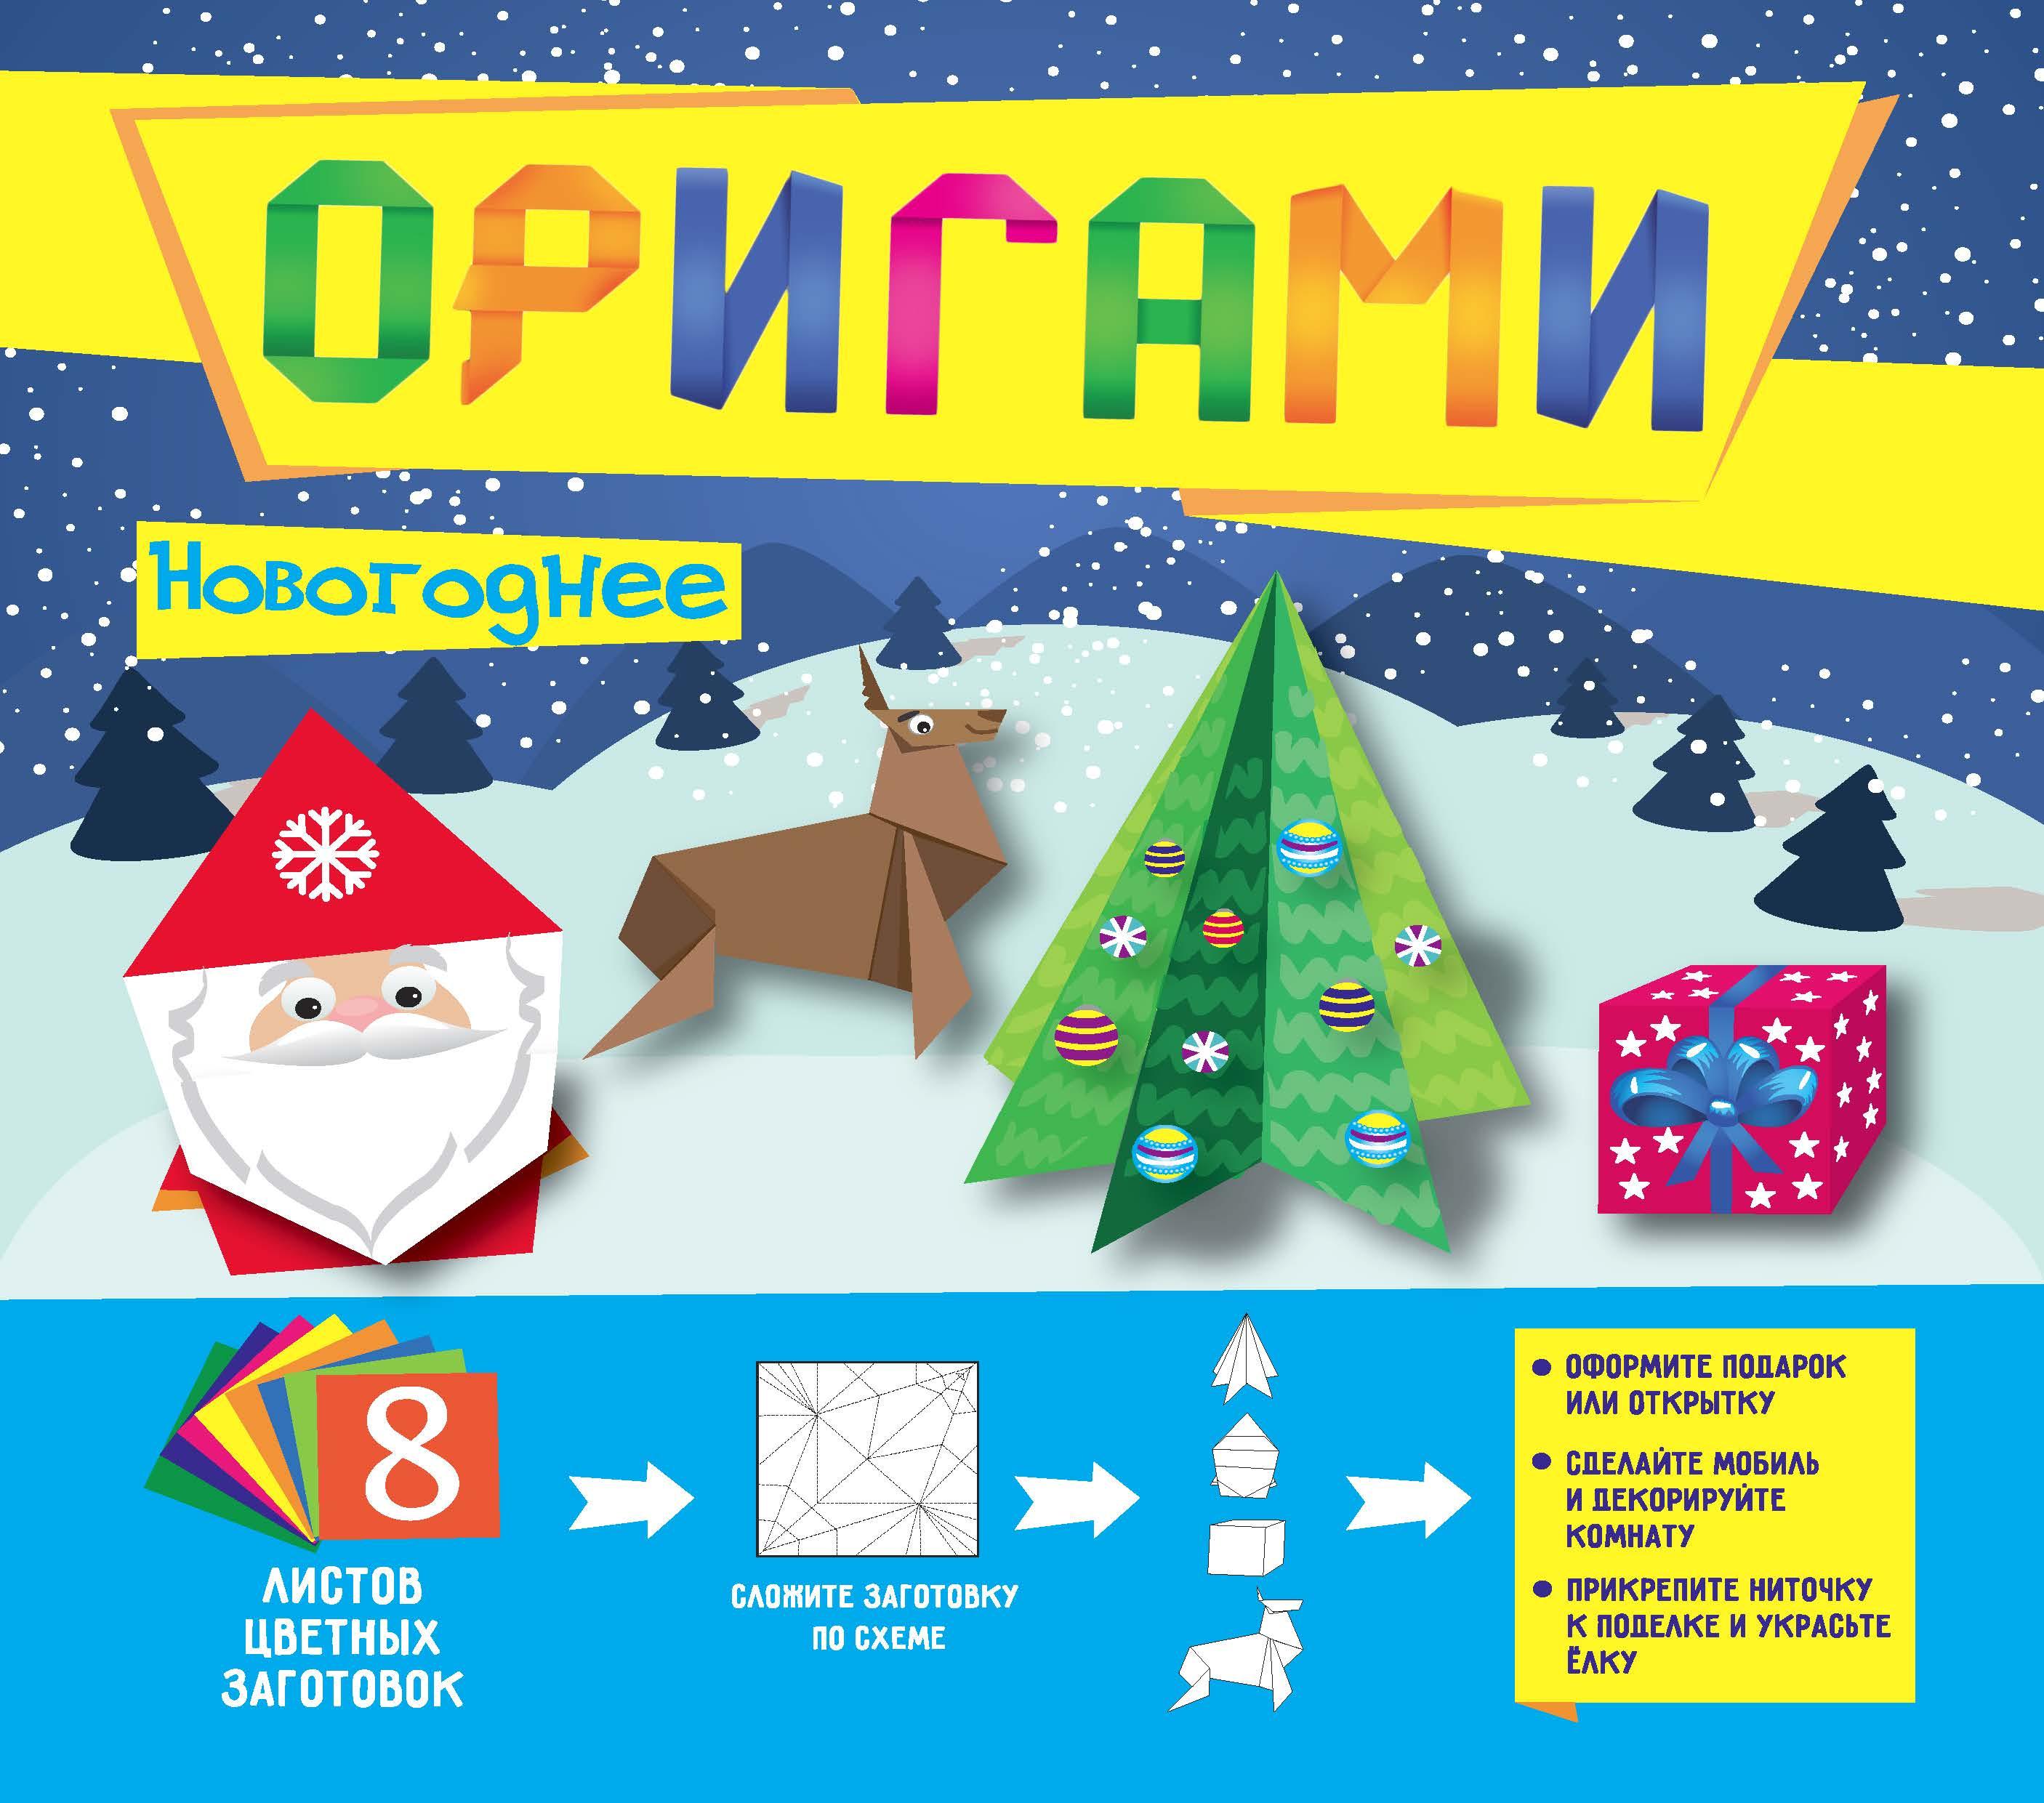 Оригами. Новогоднее новогоднее шоу птиц 2018 12 22t11 00